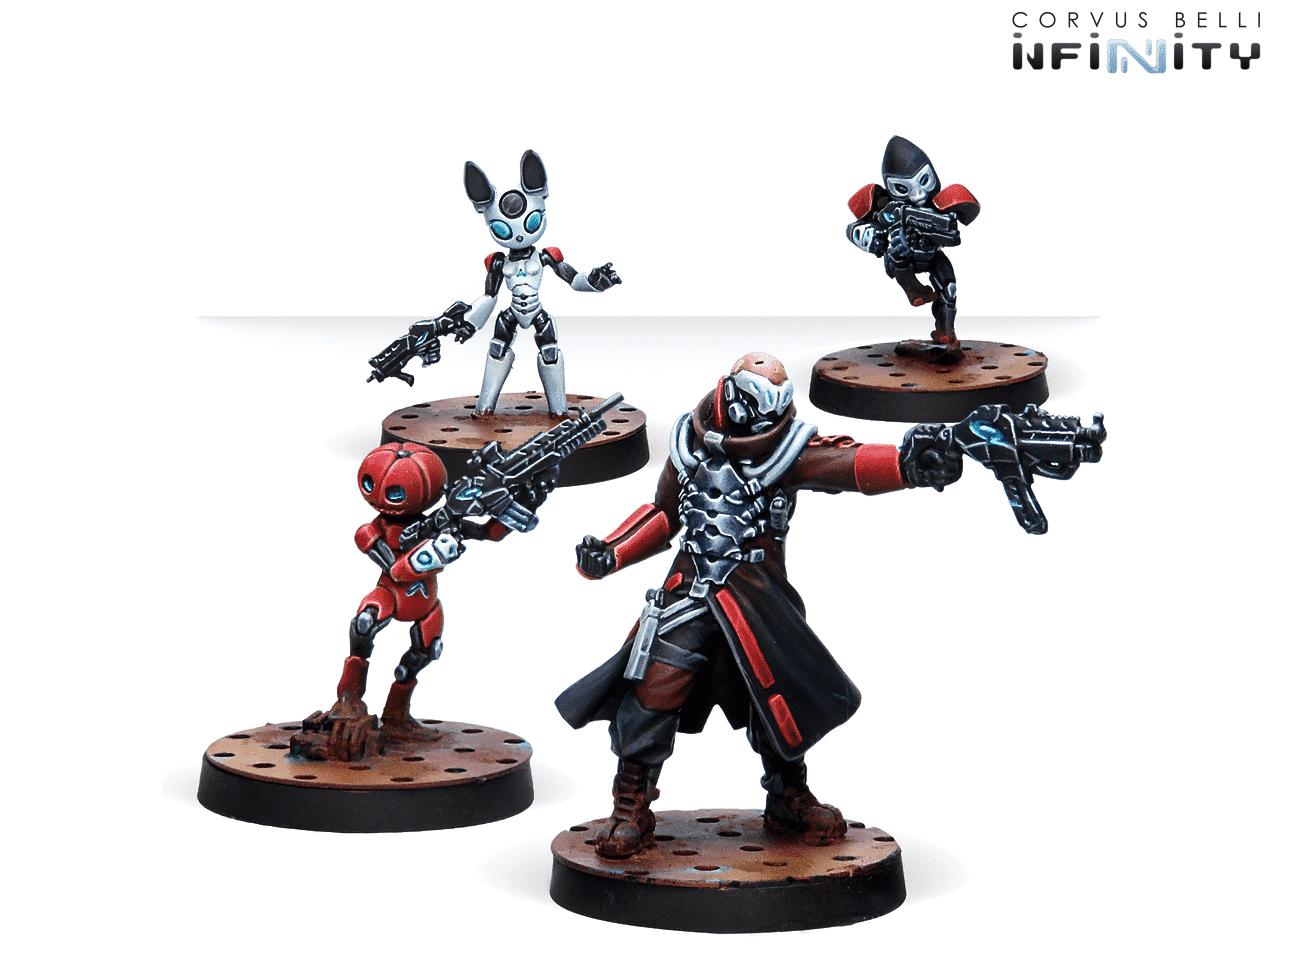 Infinity Corvus Belli Puppetactica Company Nomads box new